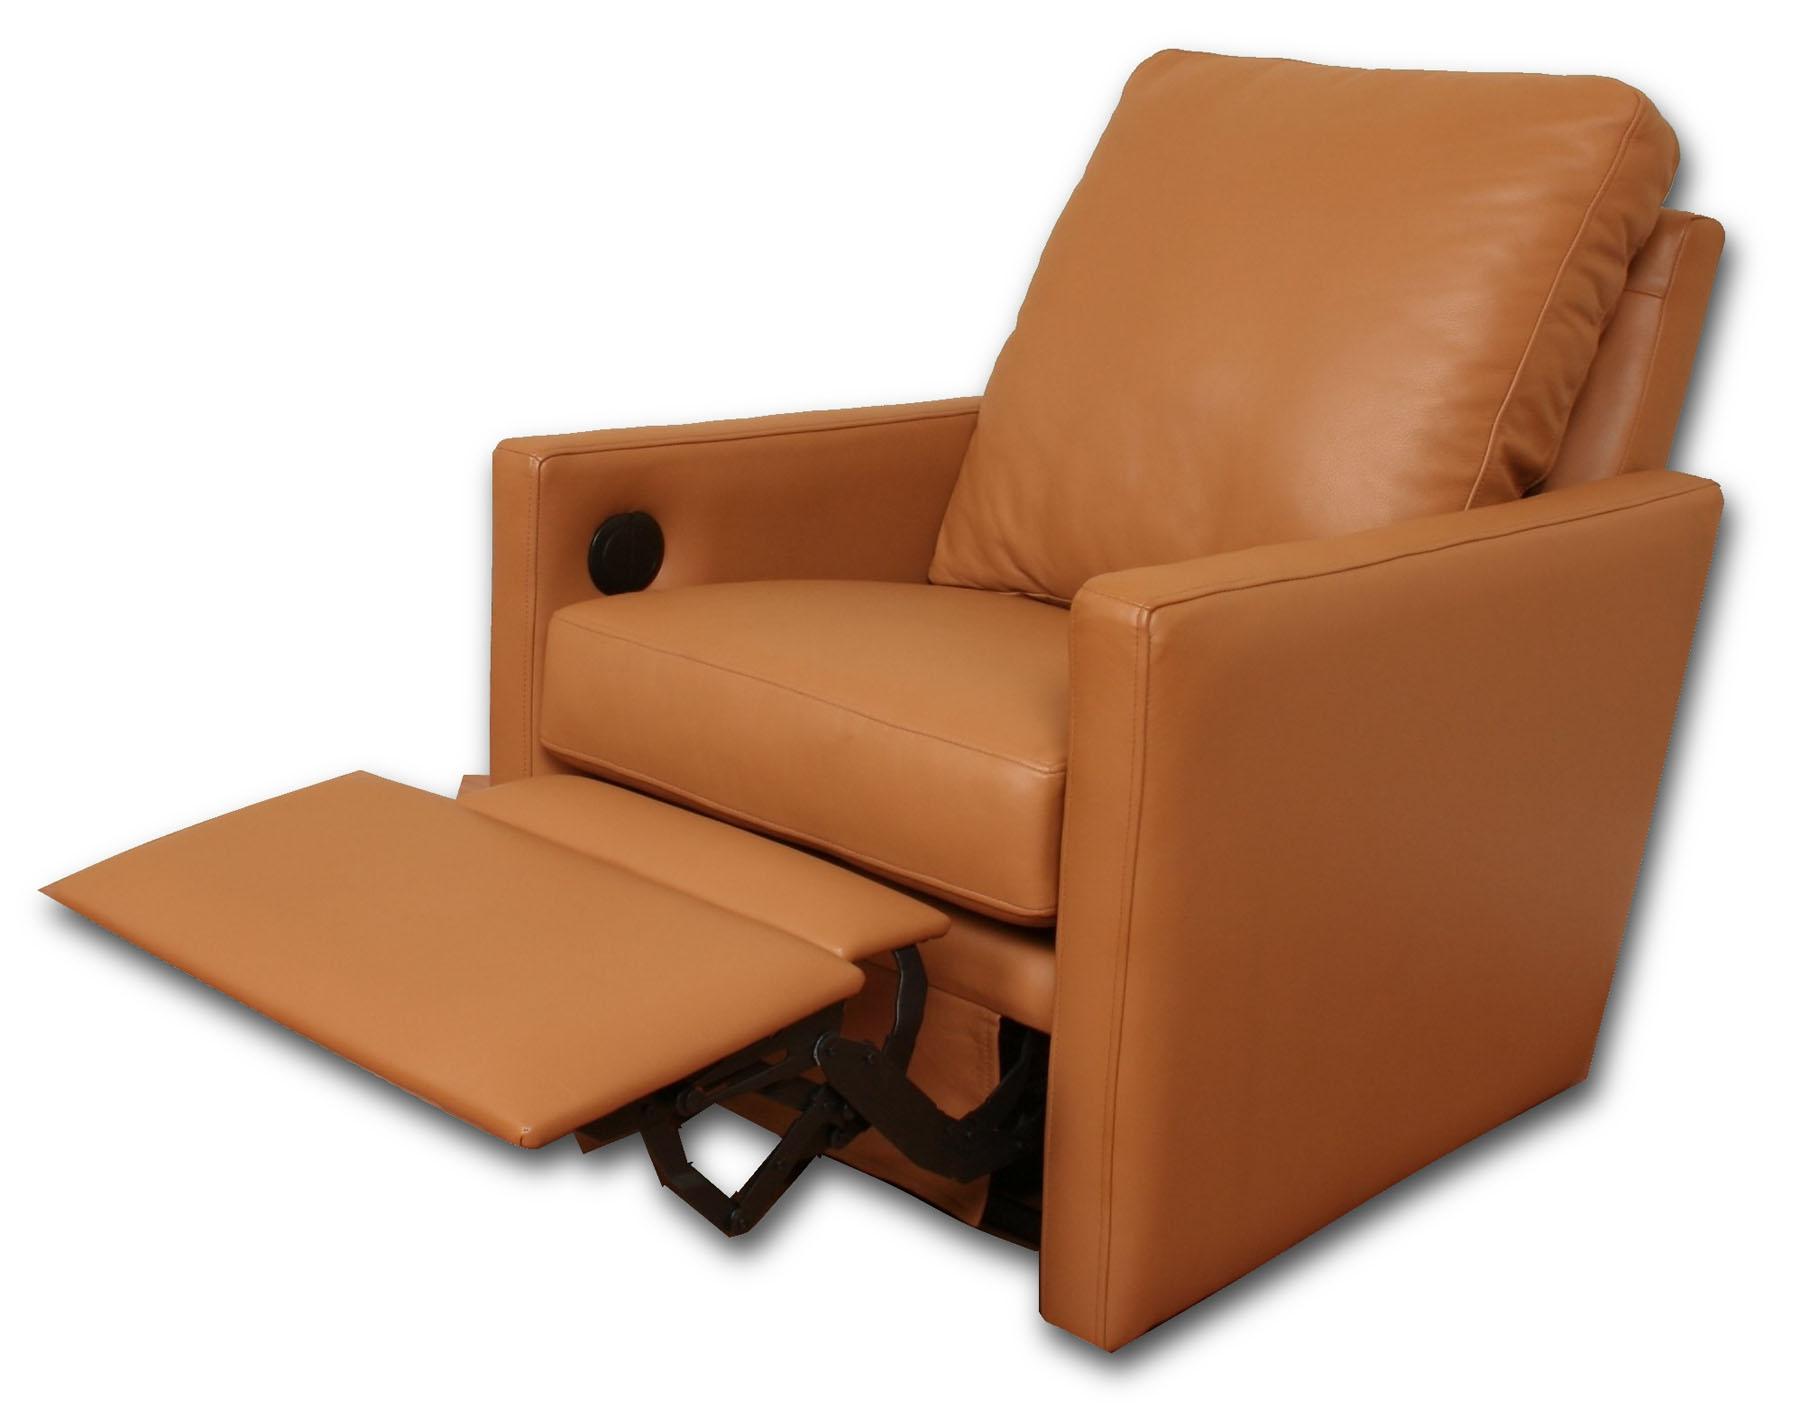 Encino Reclining Leather Sofa